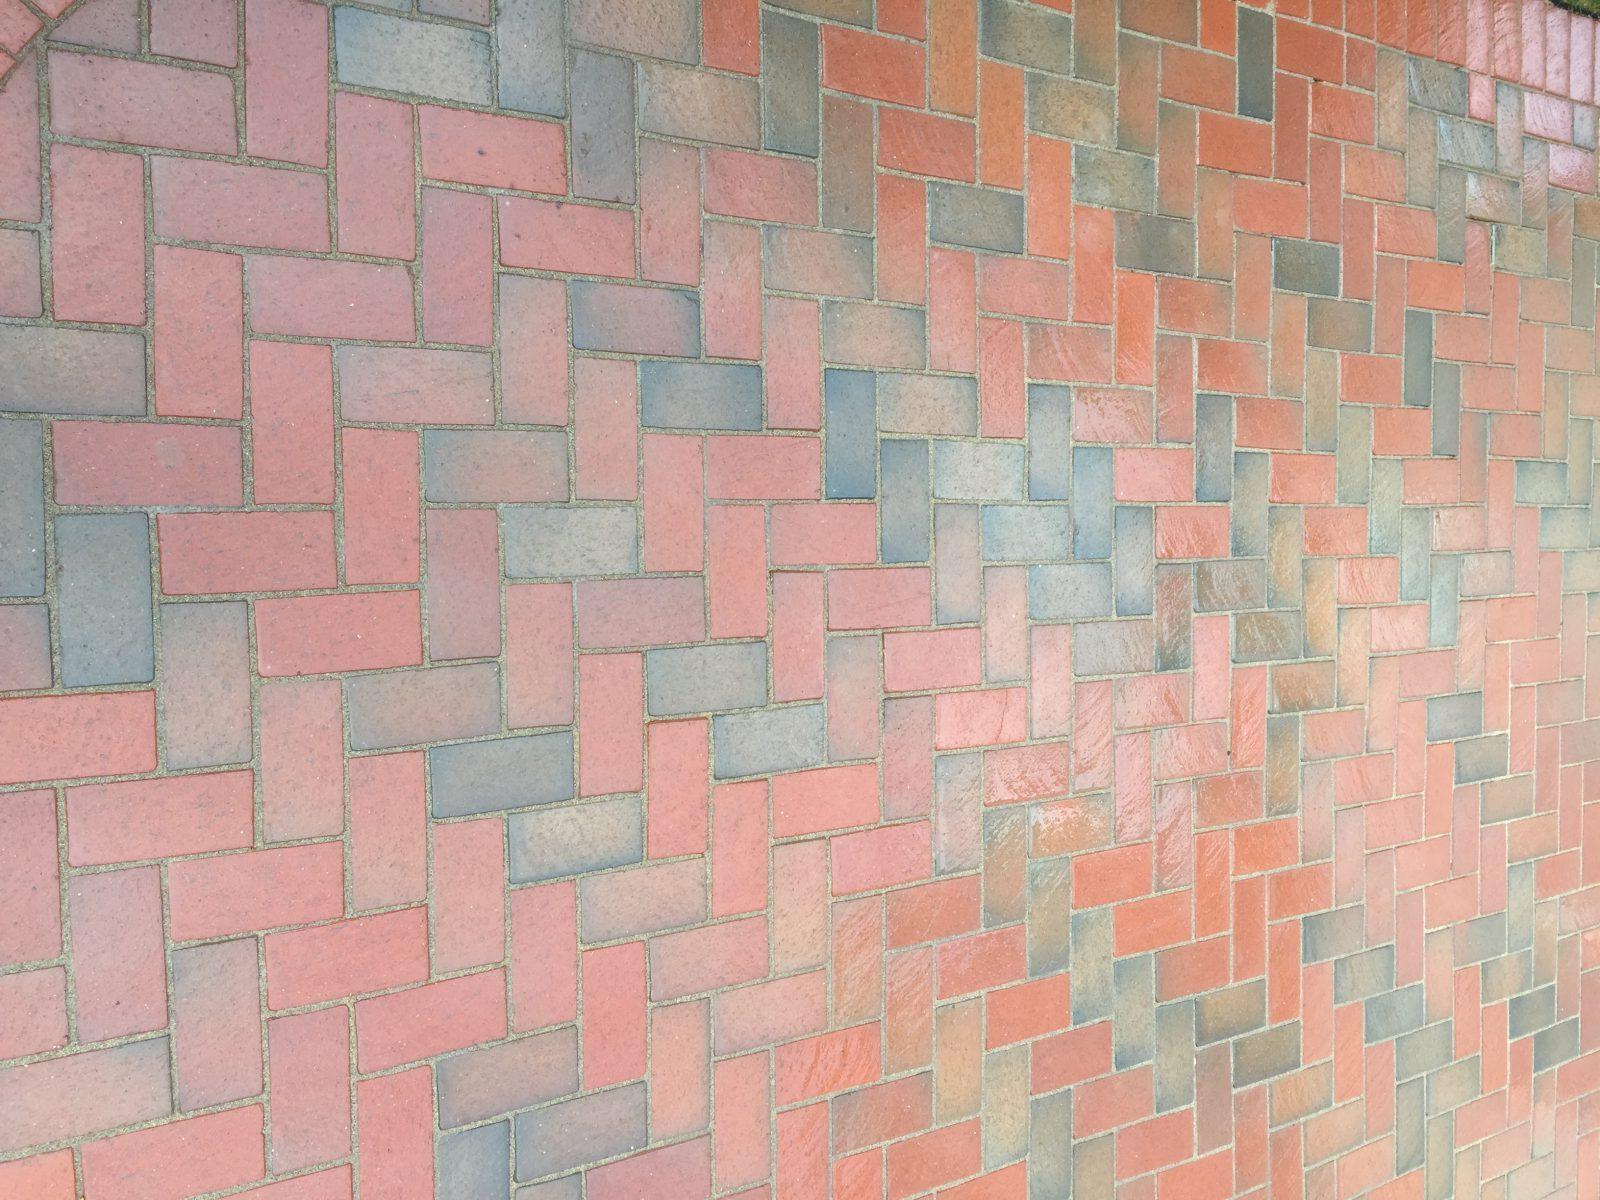 brick paver patio cleaning re-sanding sealing